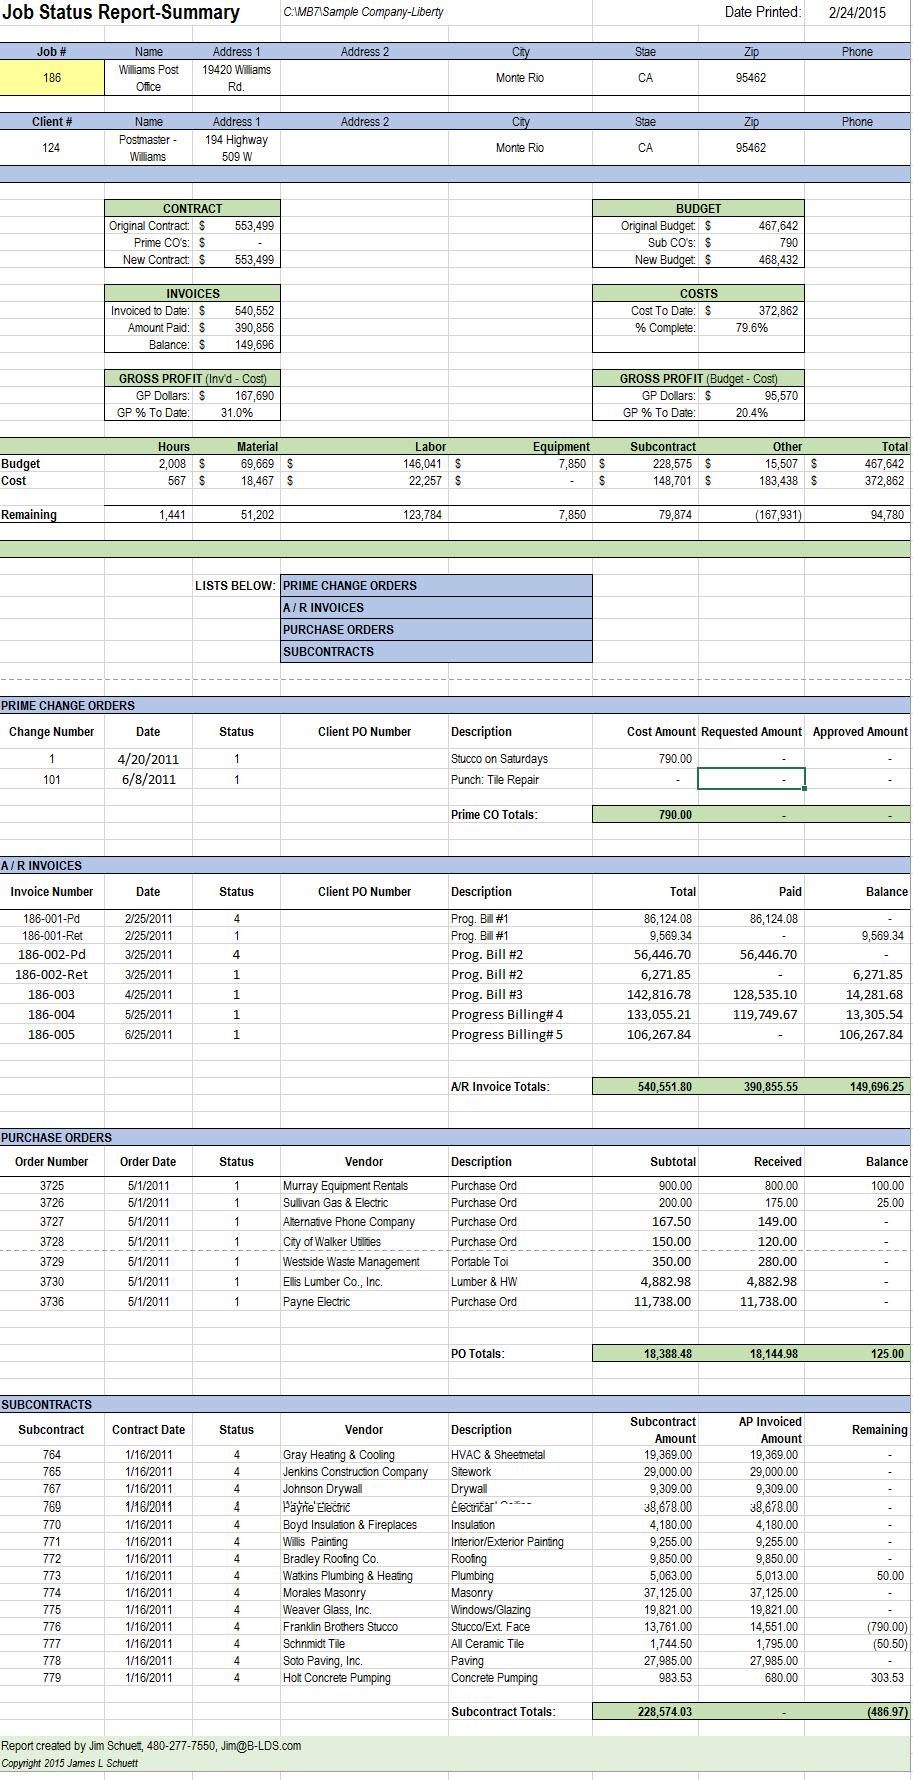 LR-6-1-1-21T-Job-Status-Report-Liberty-Reports